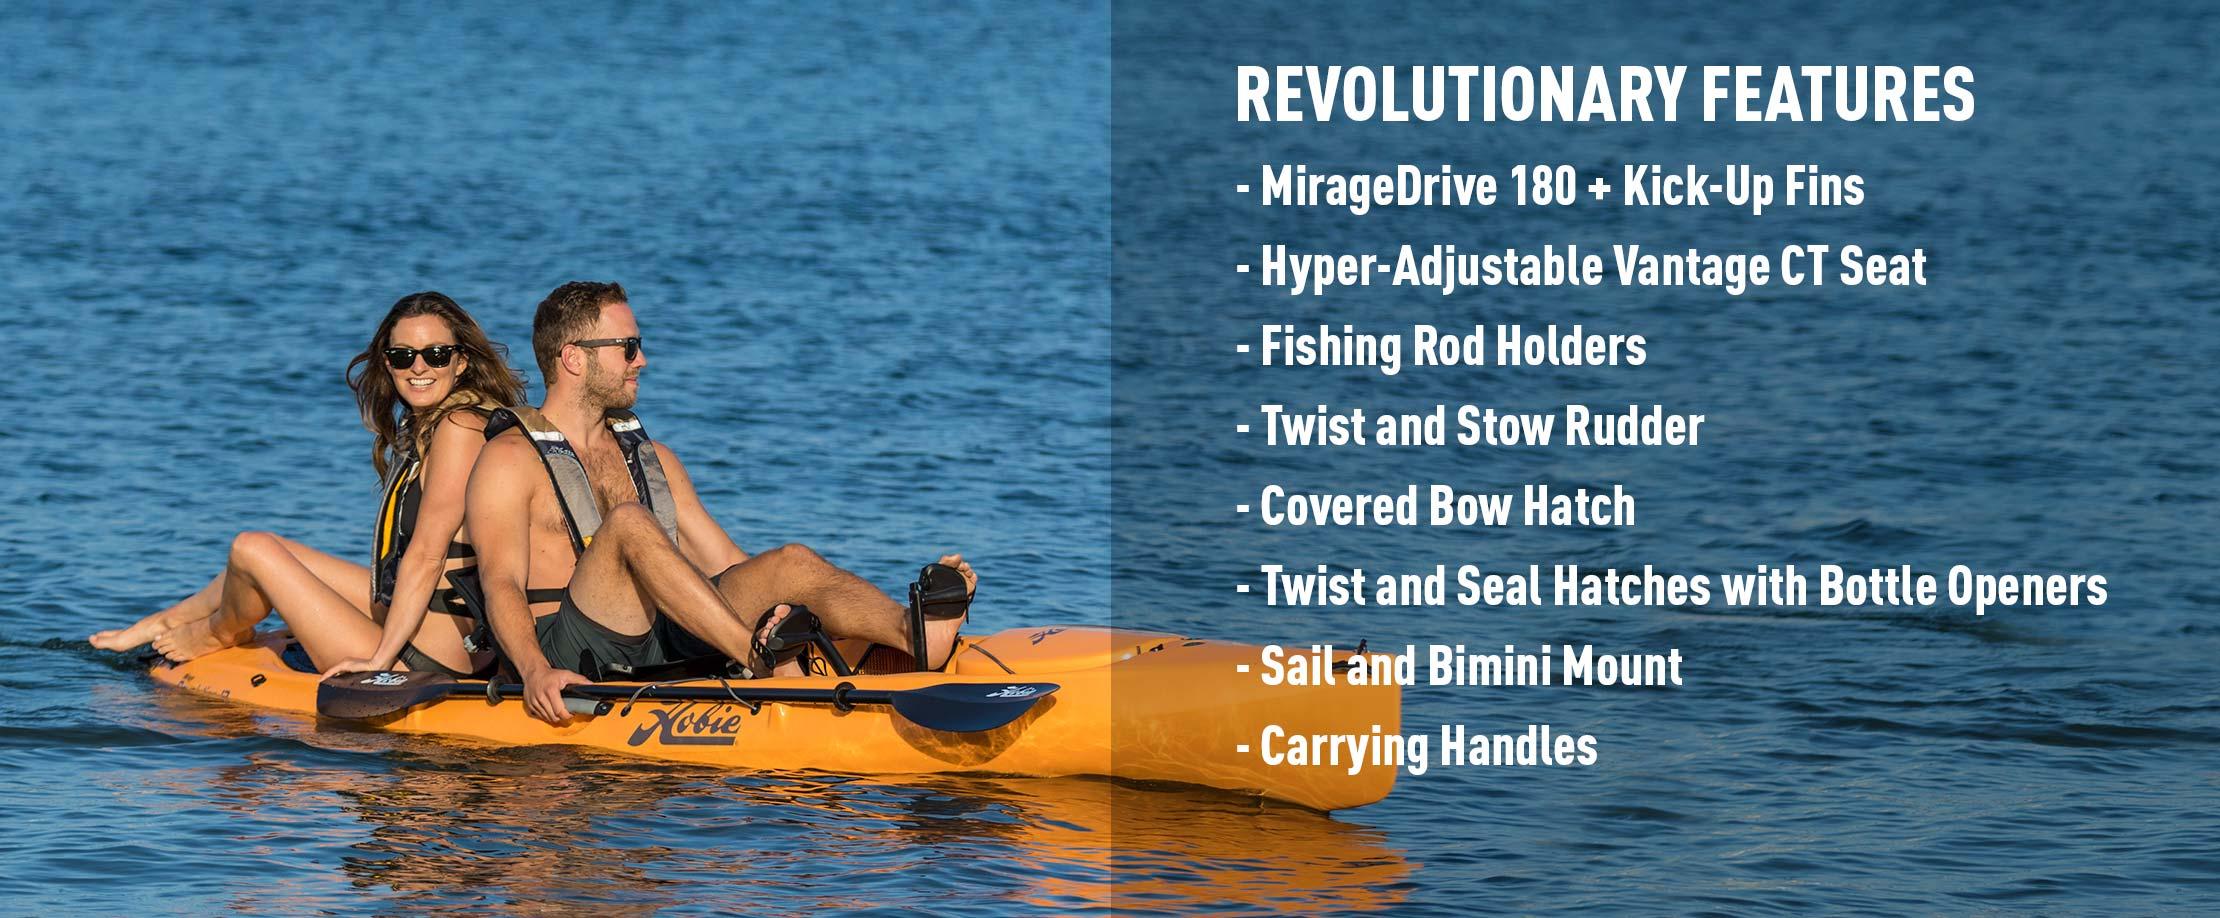 Mirage Revolution 13 Features